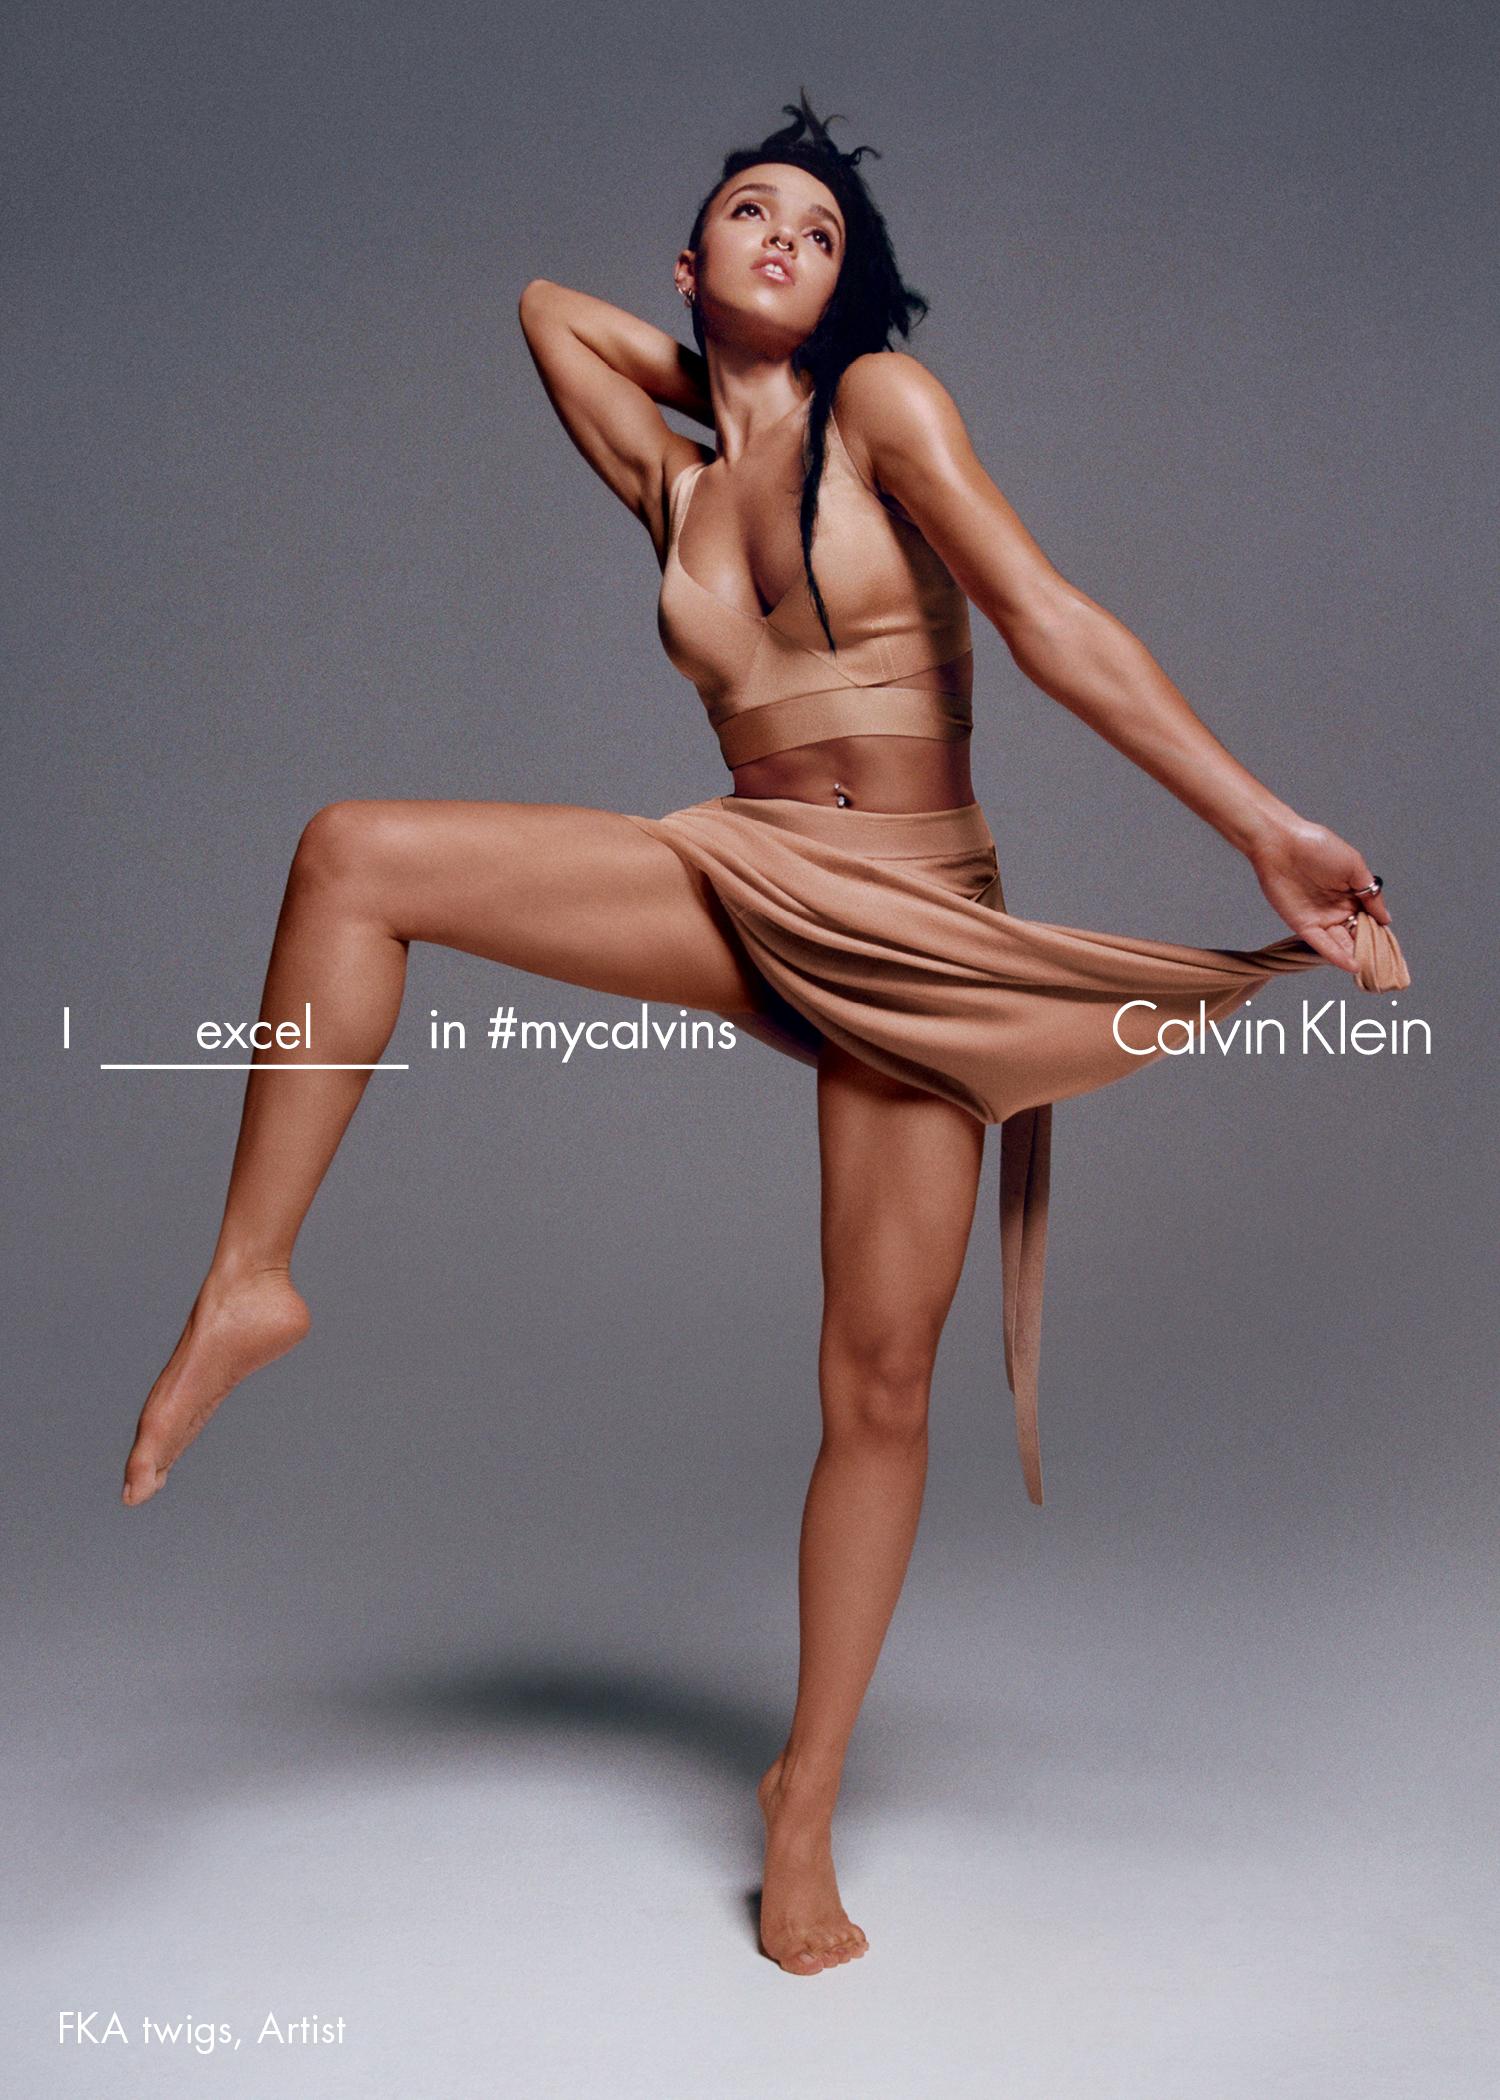 Foto de Calvin Klein PV 2016 (14/32)